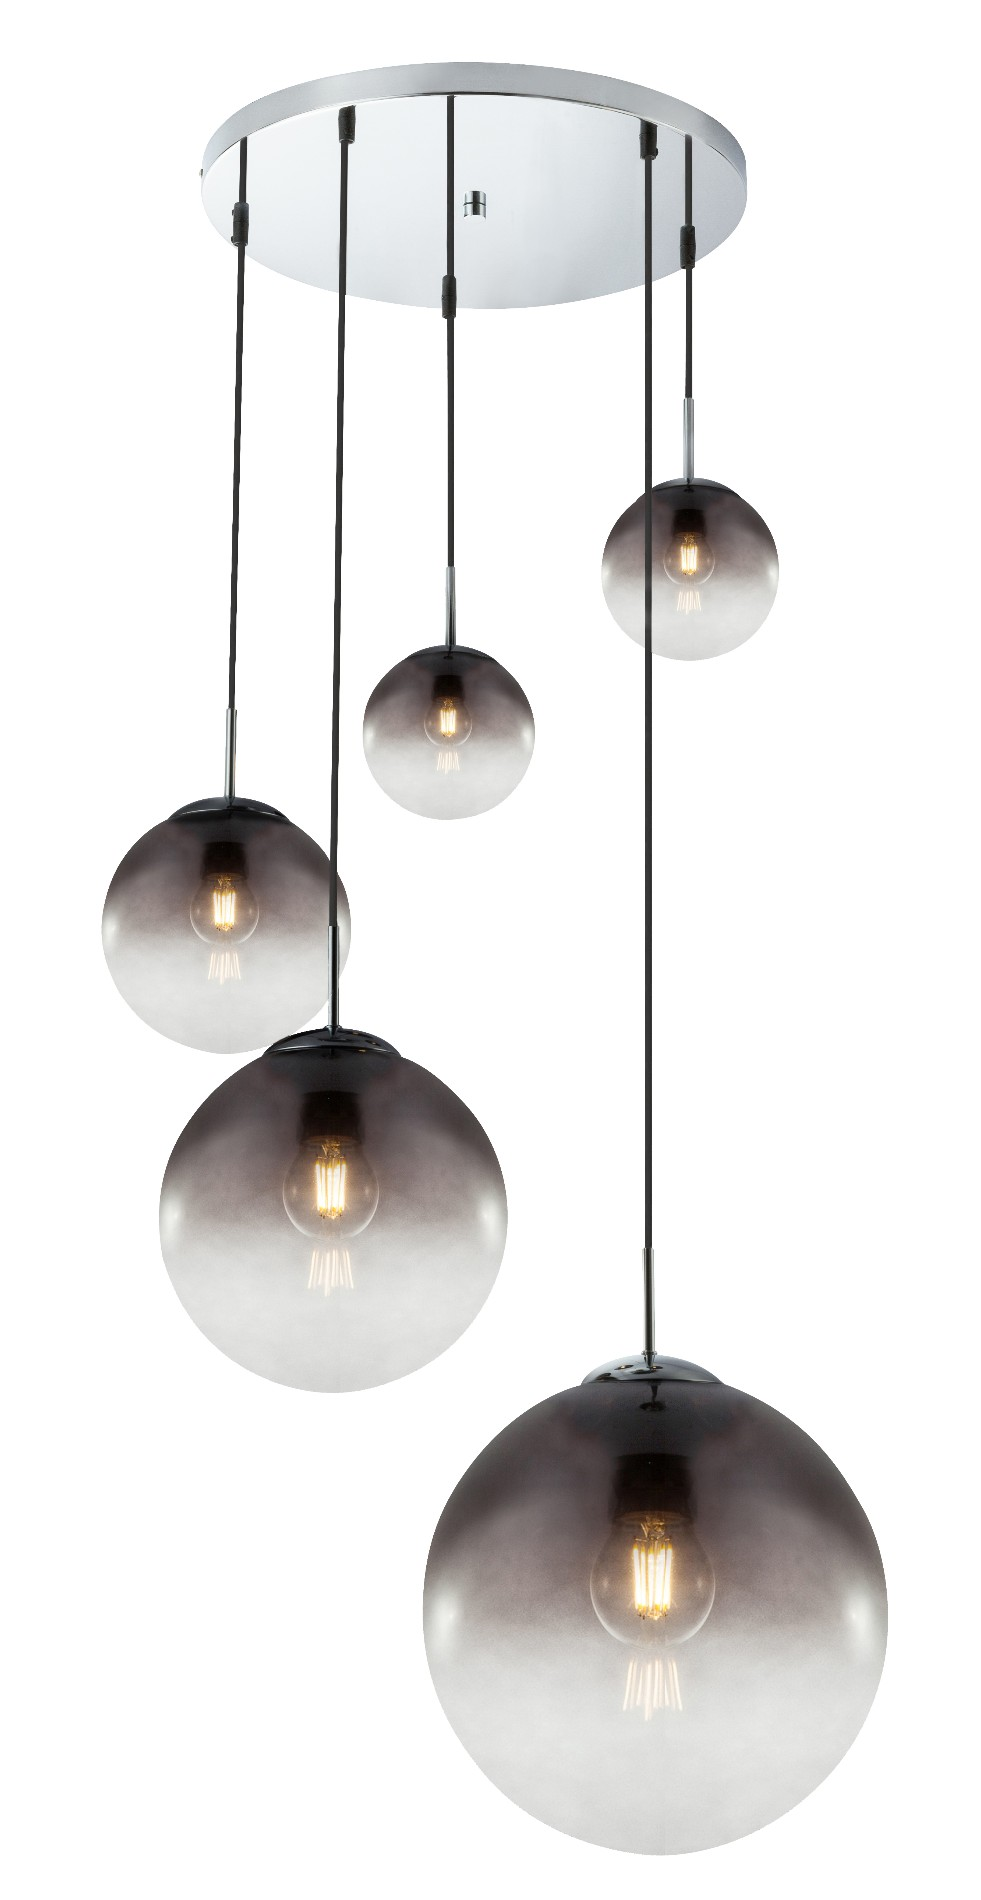 glass pendant ceiling light fixture